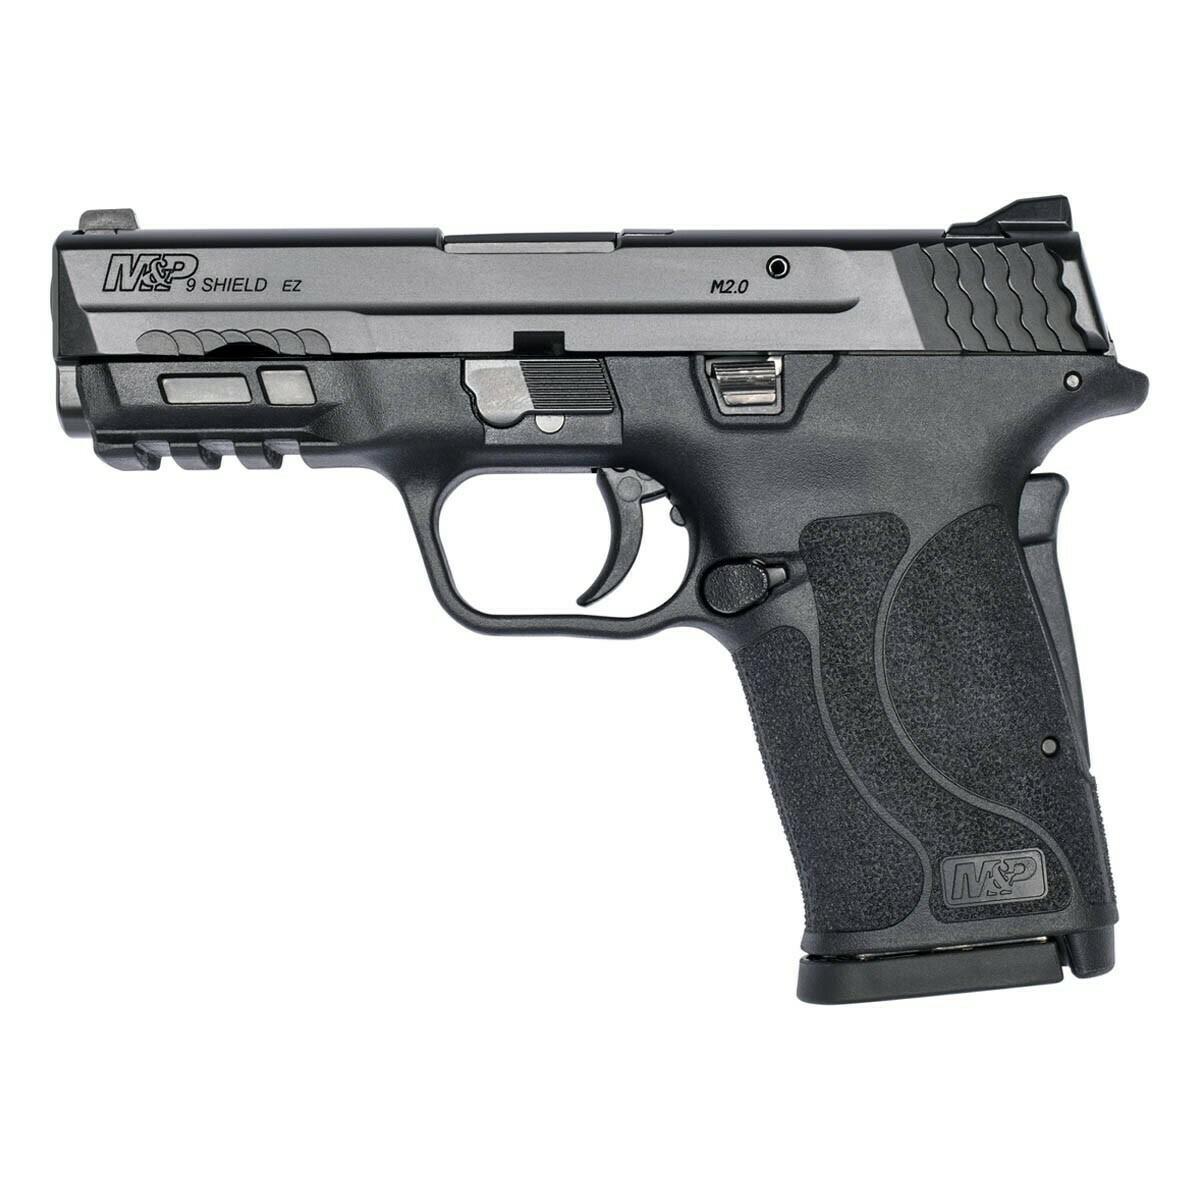 Smith & Wesson M&P9 Shield EZ M2.0